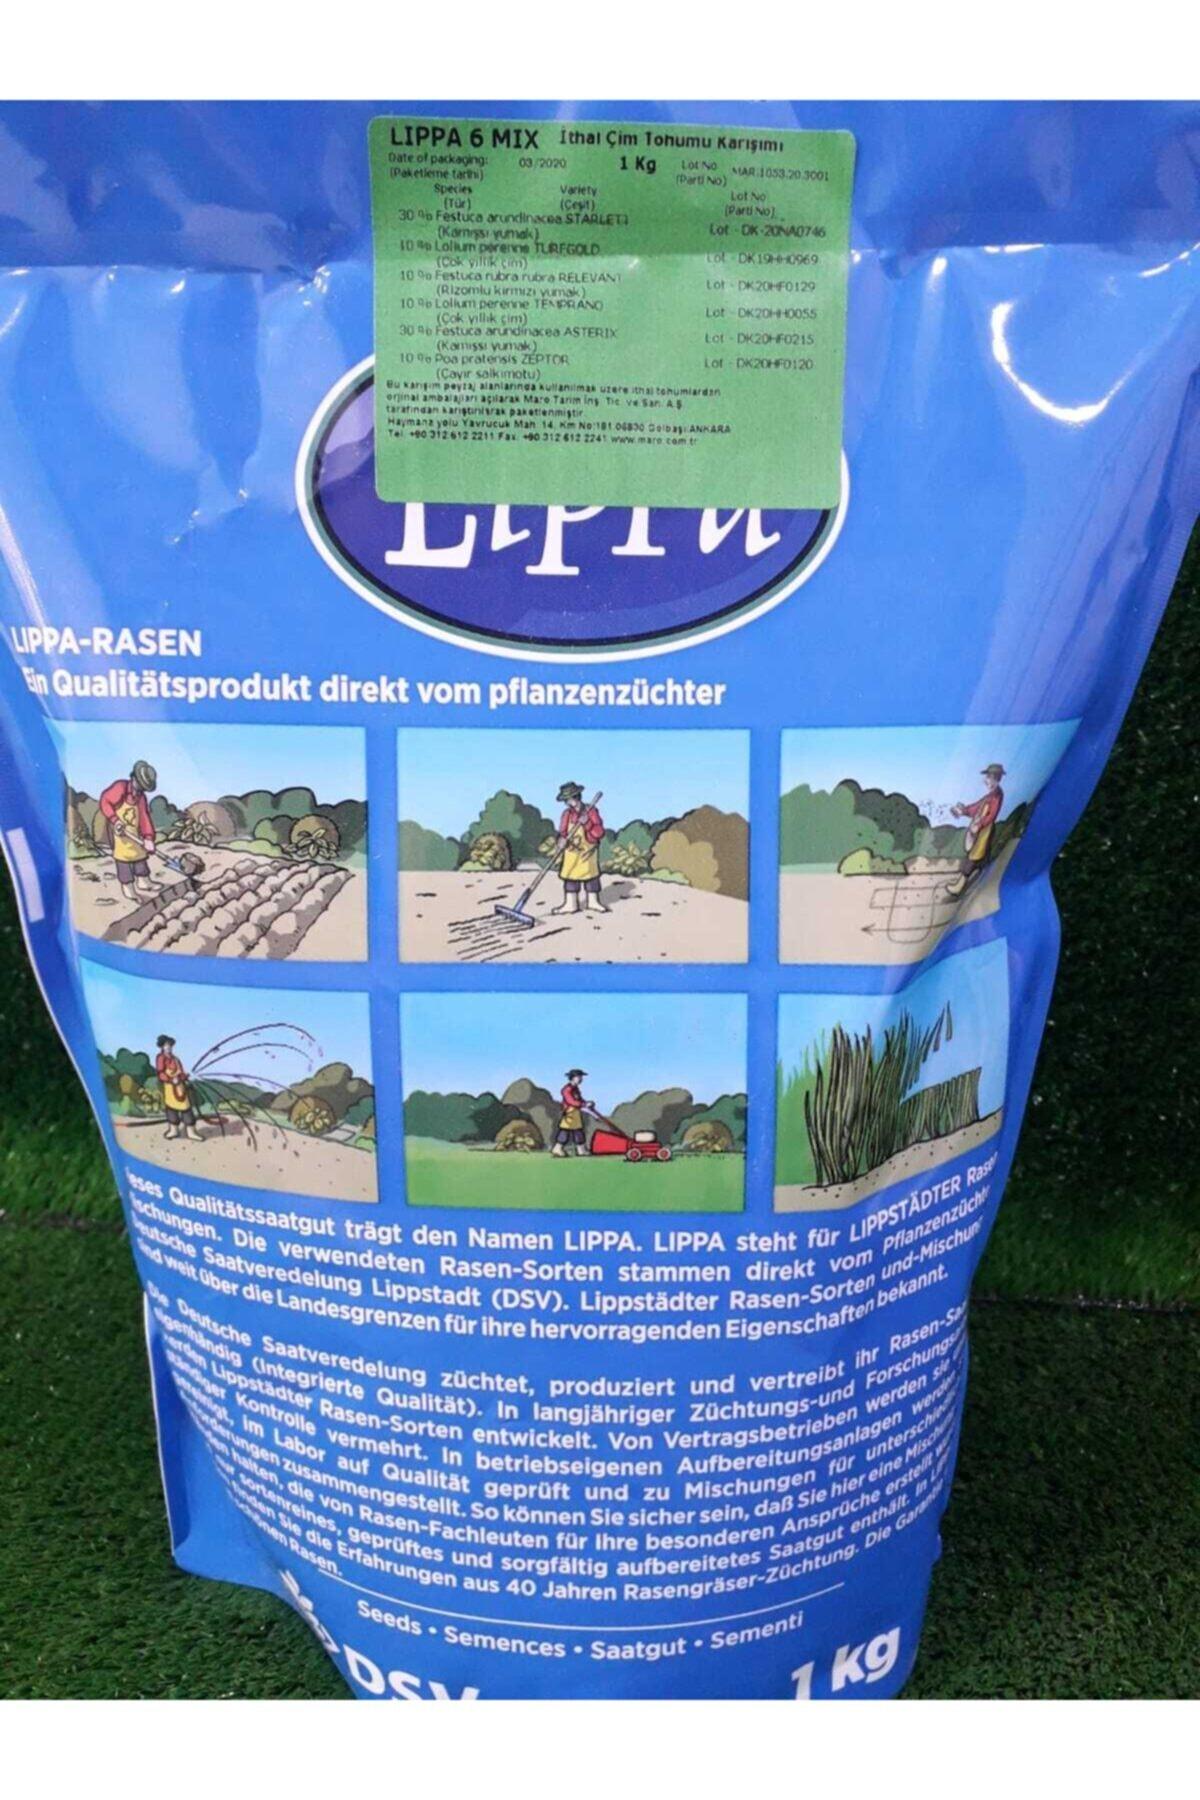 Ekodoğa Çim Tohumu 2 Kg 6 Karışım Çim Tohumu Dayanıklı 1. Kalite Çim Tohumu Yer Örtücü Karışım Çim Lolium